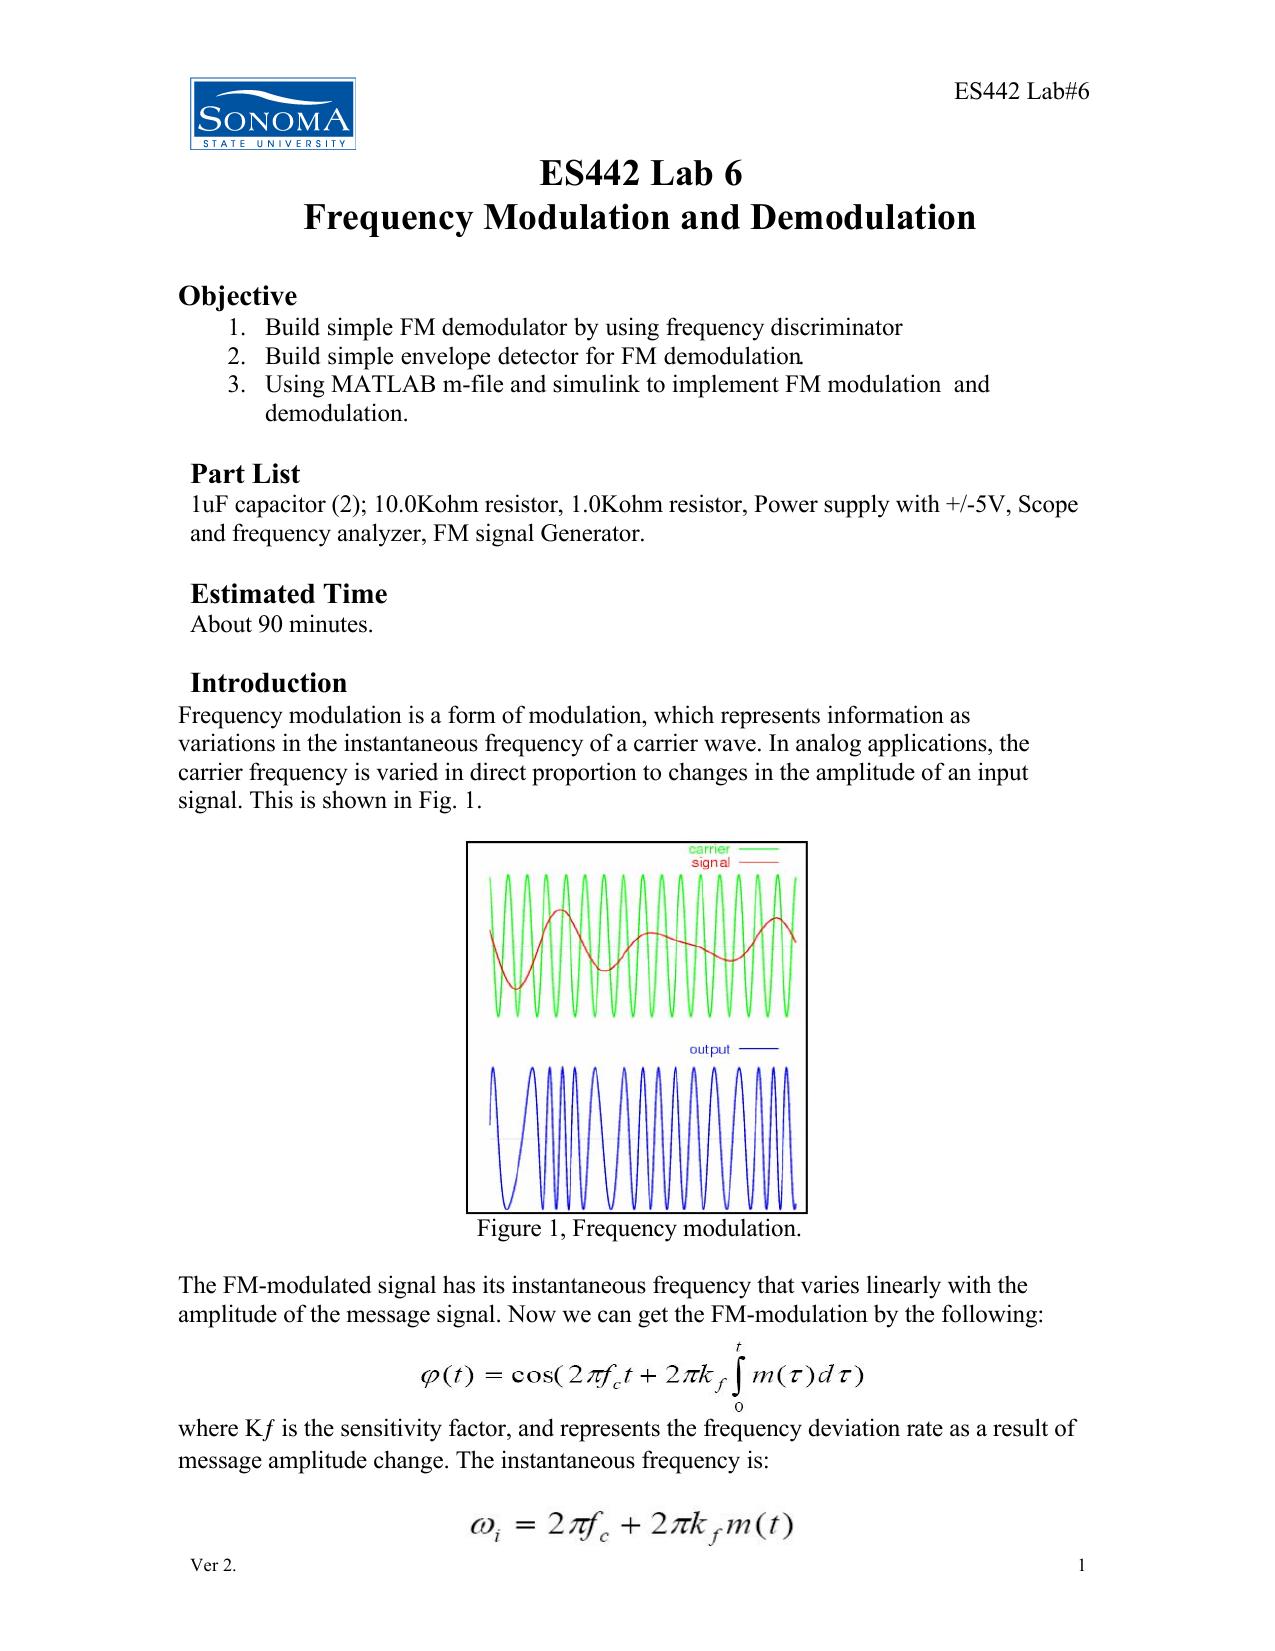 Es442 Lab 6 Frequency Modulation And Demodulation Fm Modulator Block Diagram 018293569 1 E5148a07e7c5064f8306af486f012e8c